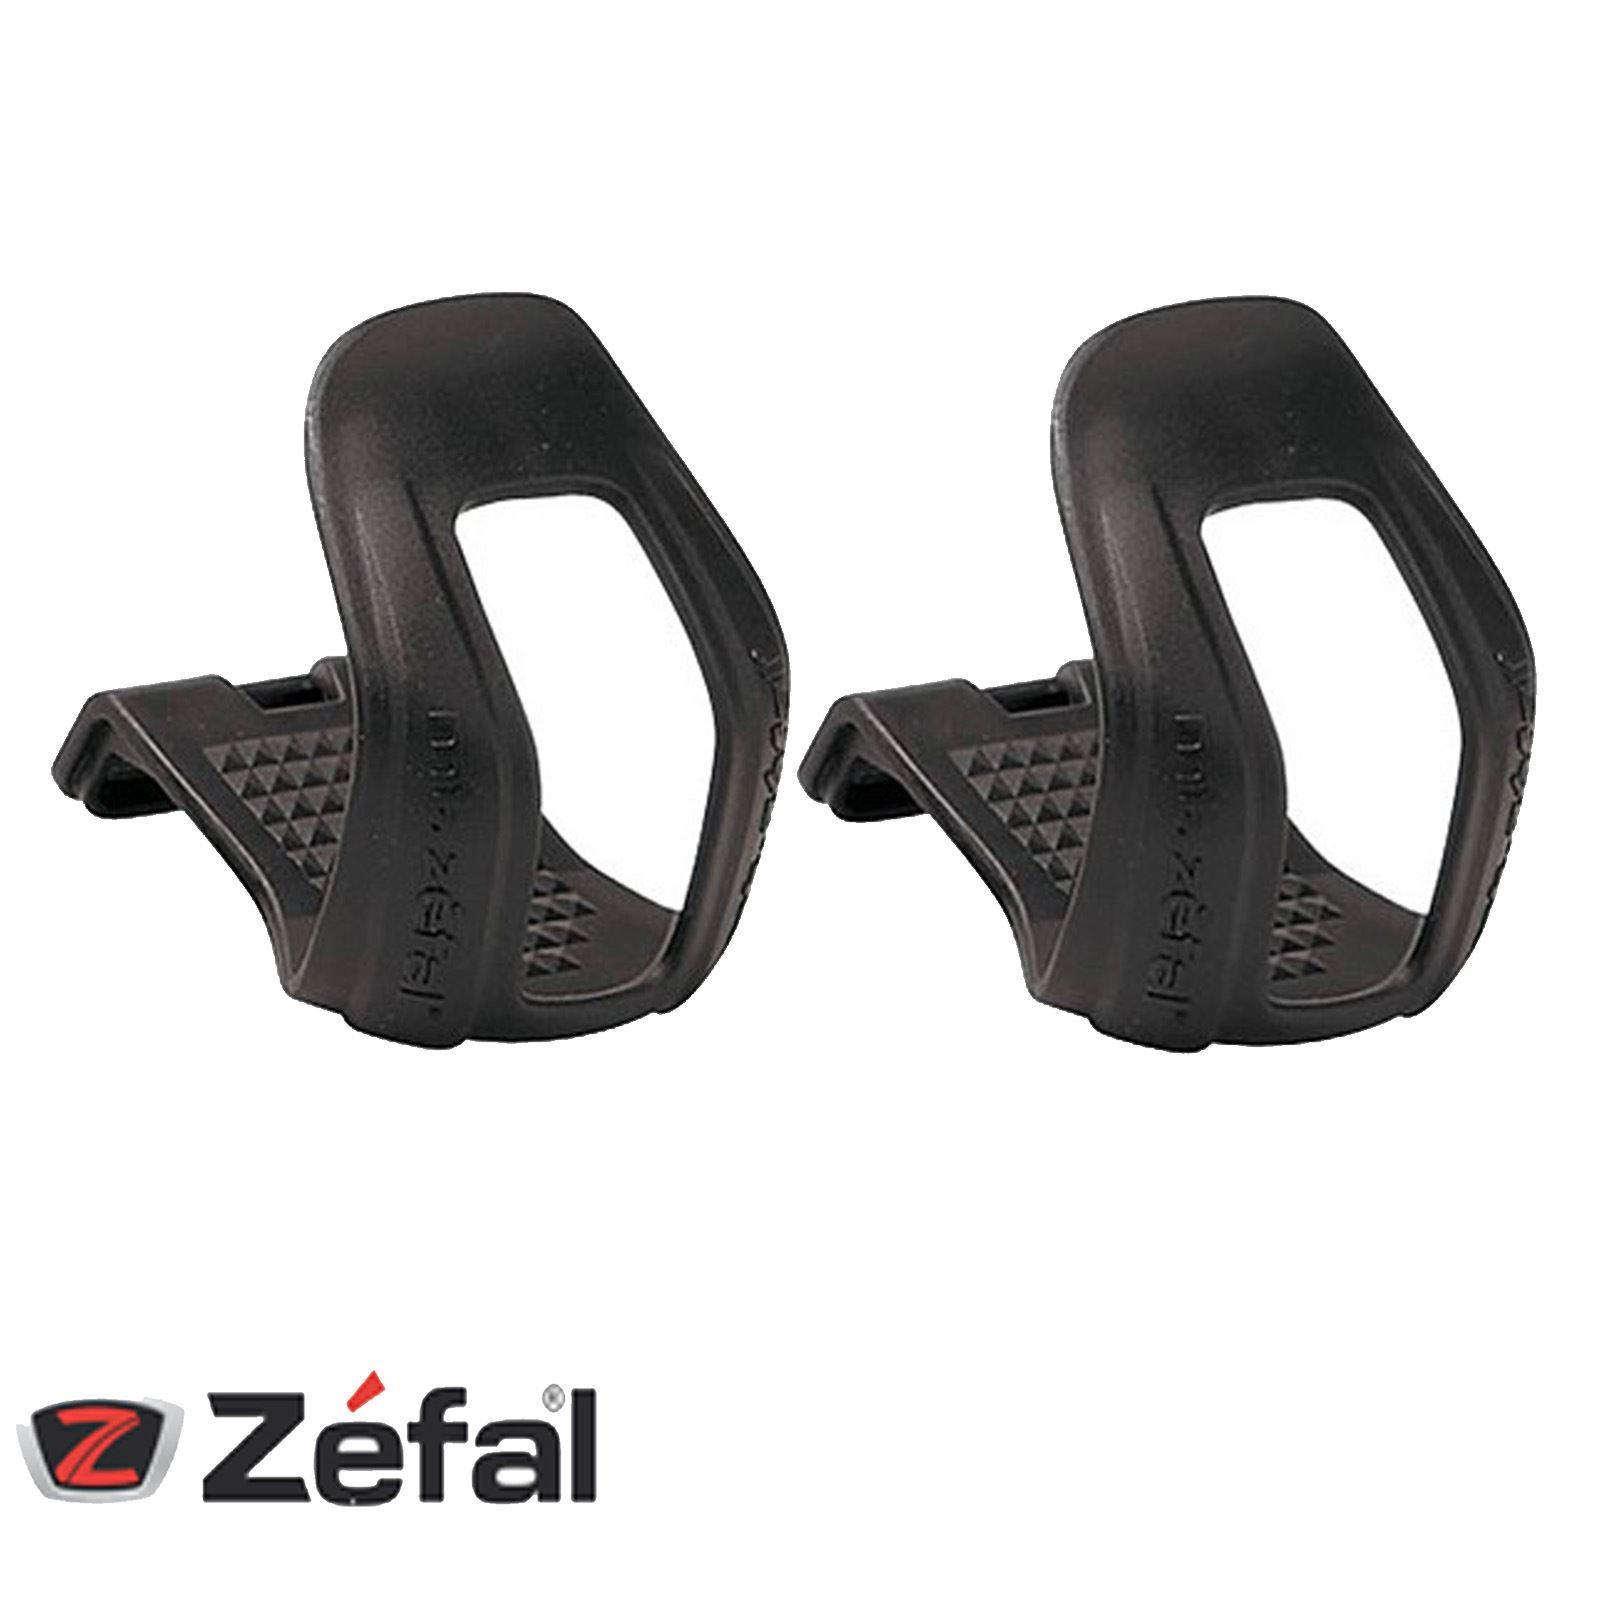 ZEFAL BIKE BICYCLE ROAD//MTB HALF MINI PEDAL TOE CLIPS